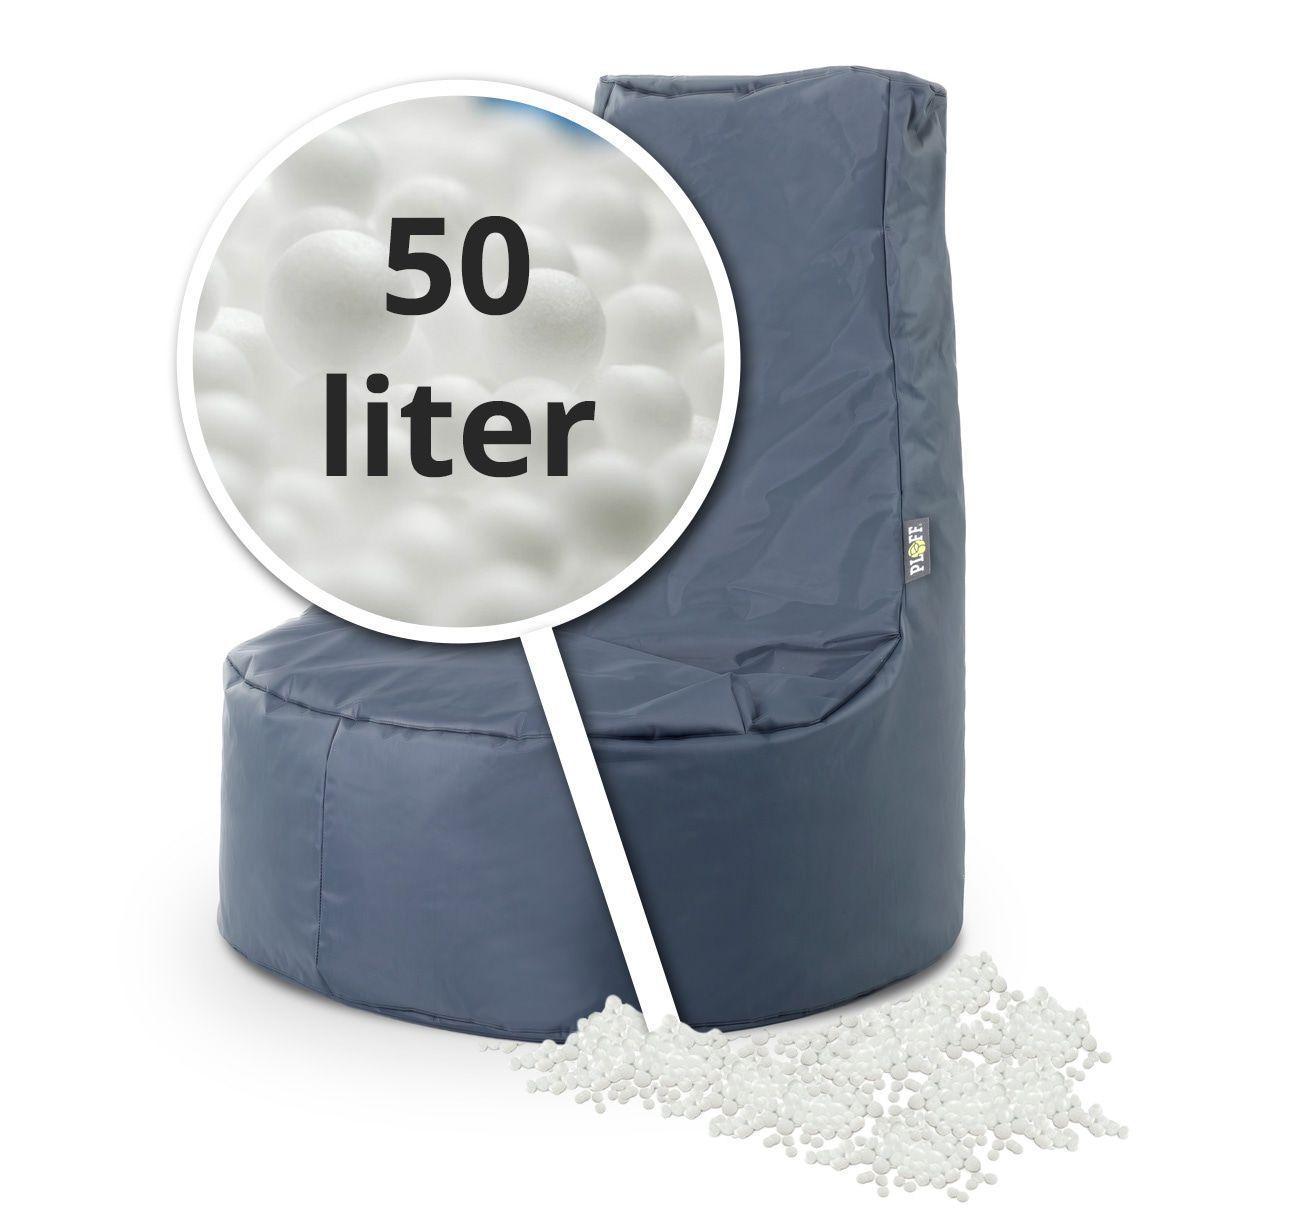 EPS Zitzak Navulling 50 liter